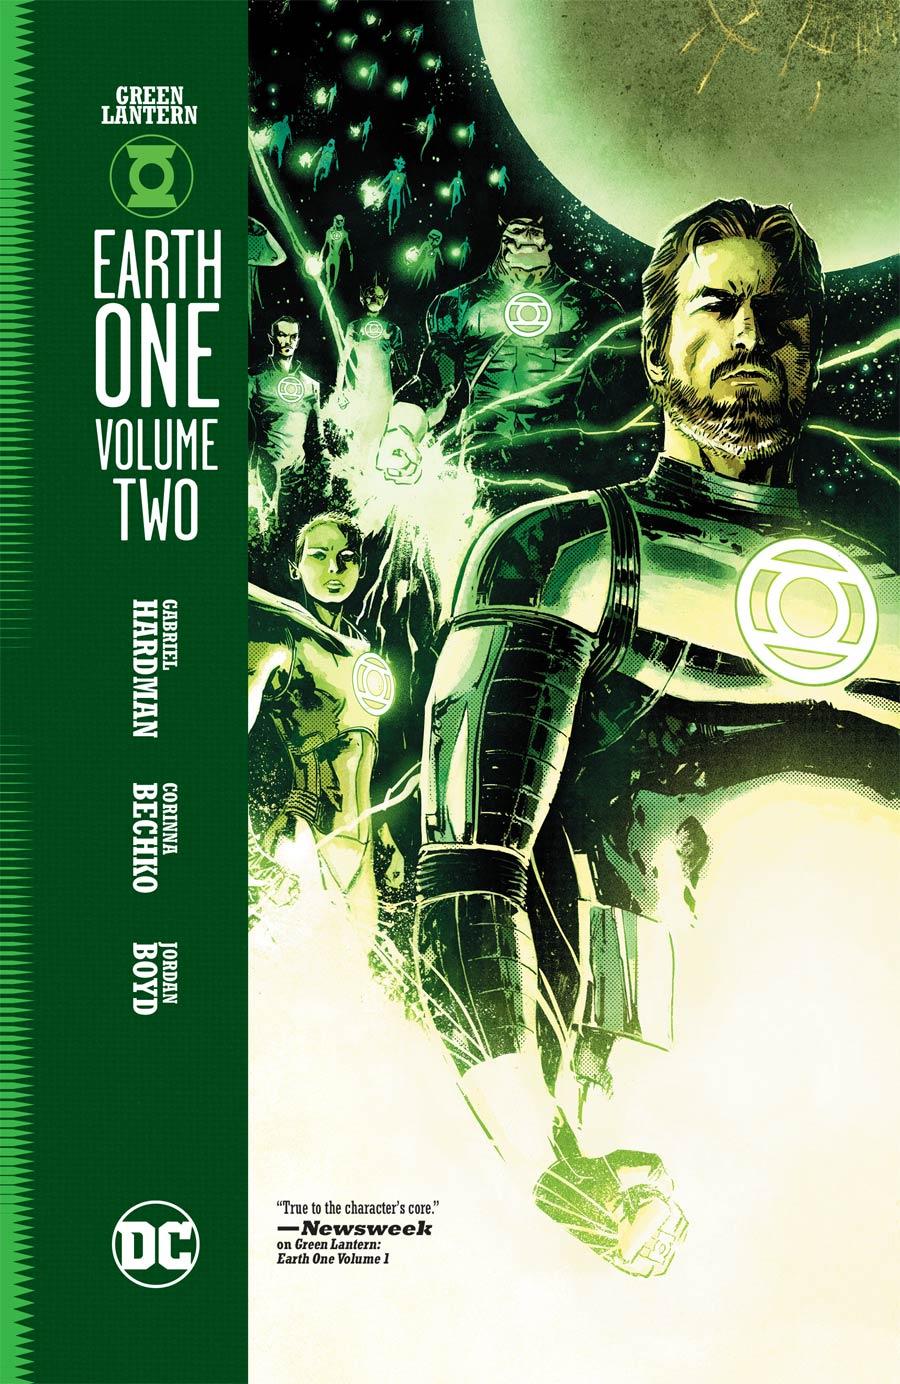 Green Lantern Earth One Vol 2 HC